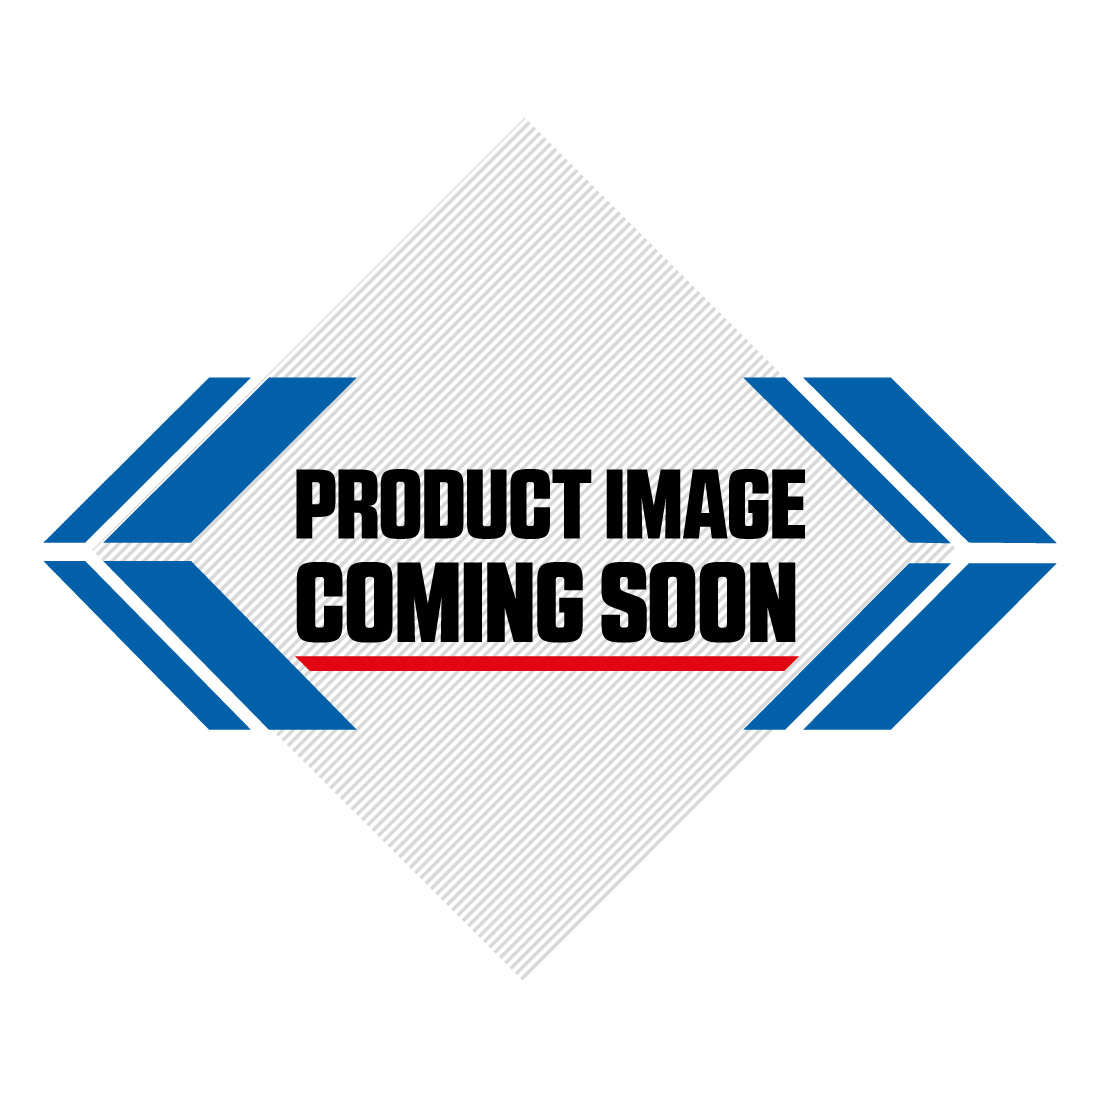 2019 UFO Interceptor 2 Helmet - Galaxy Limited Edition Image-4>